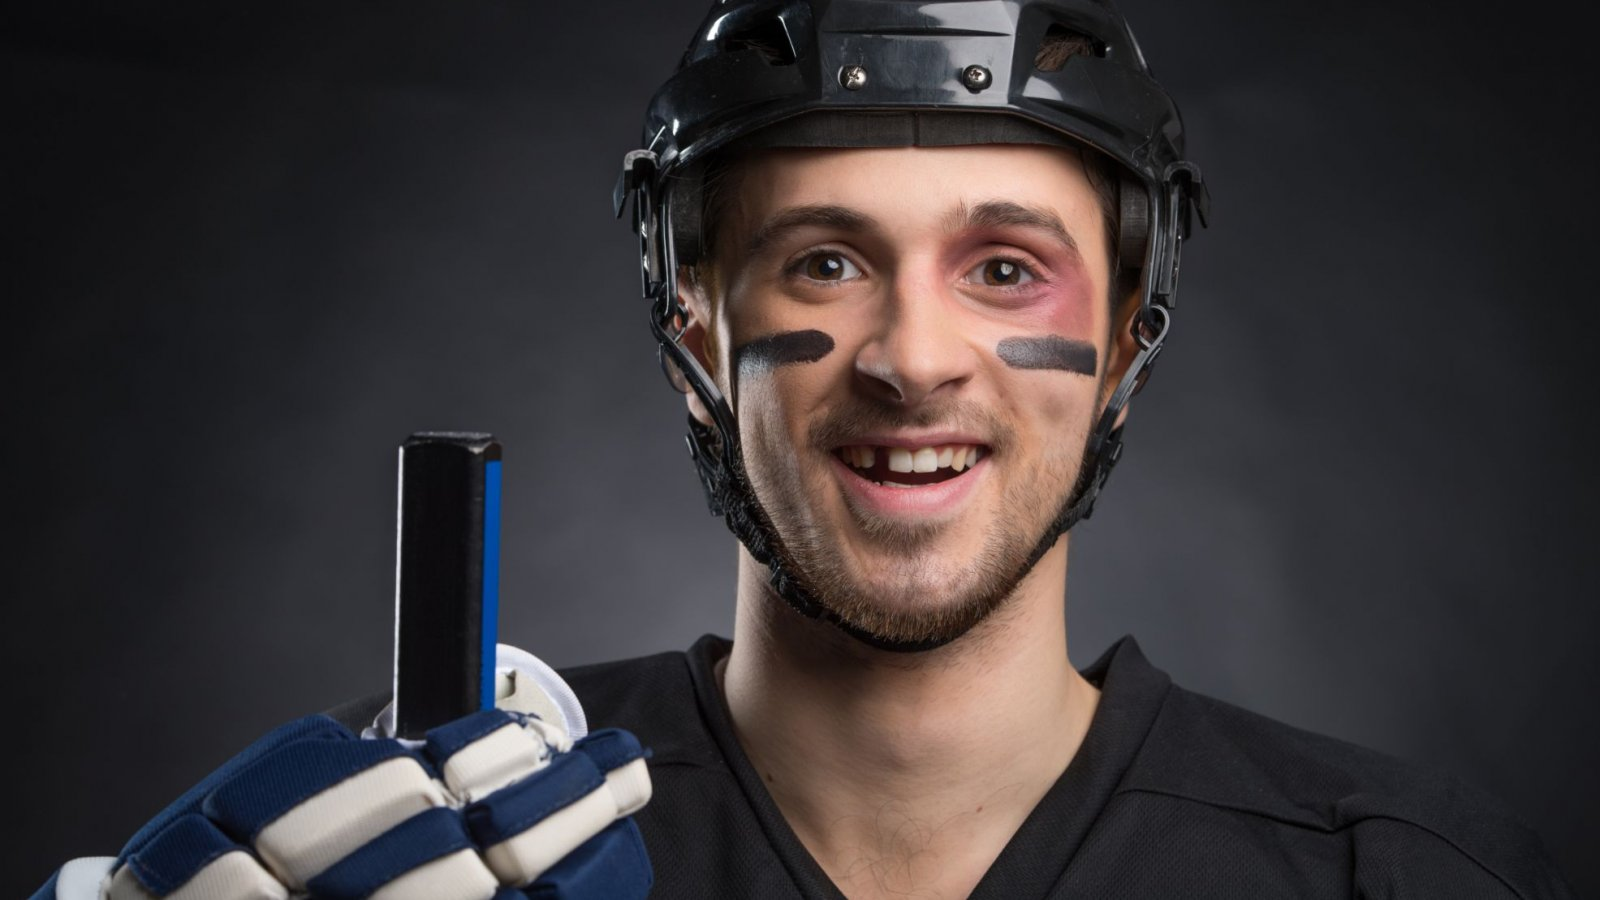 hockey player smiling holding a hockey stick